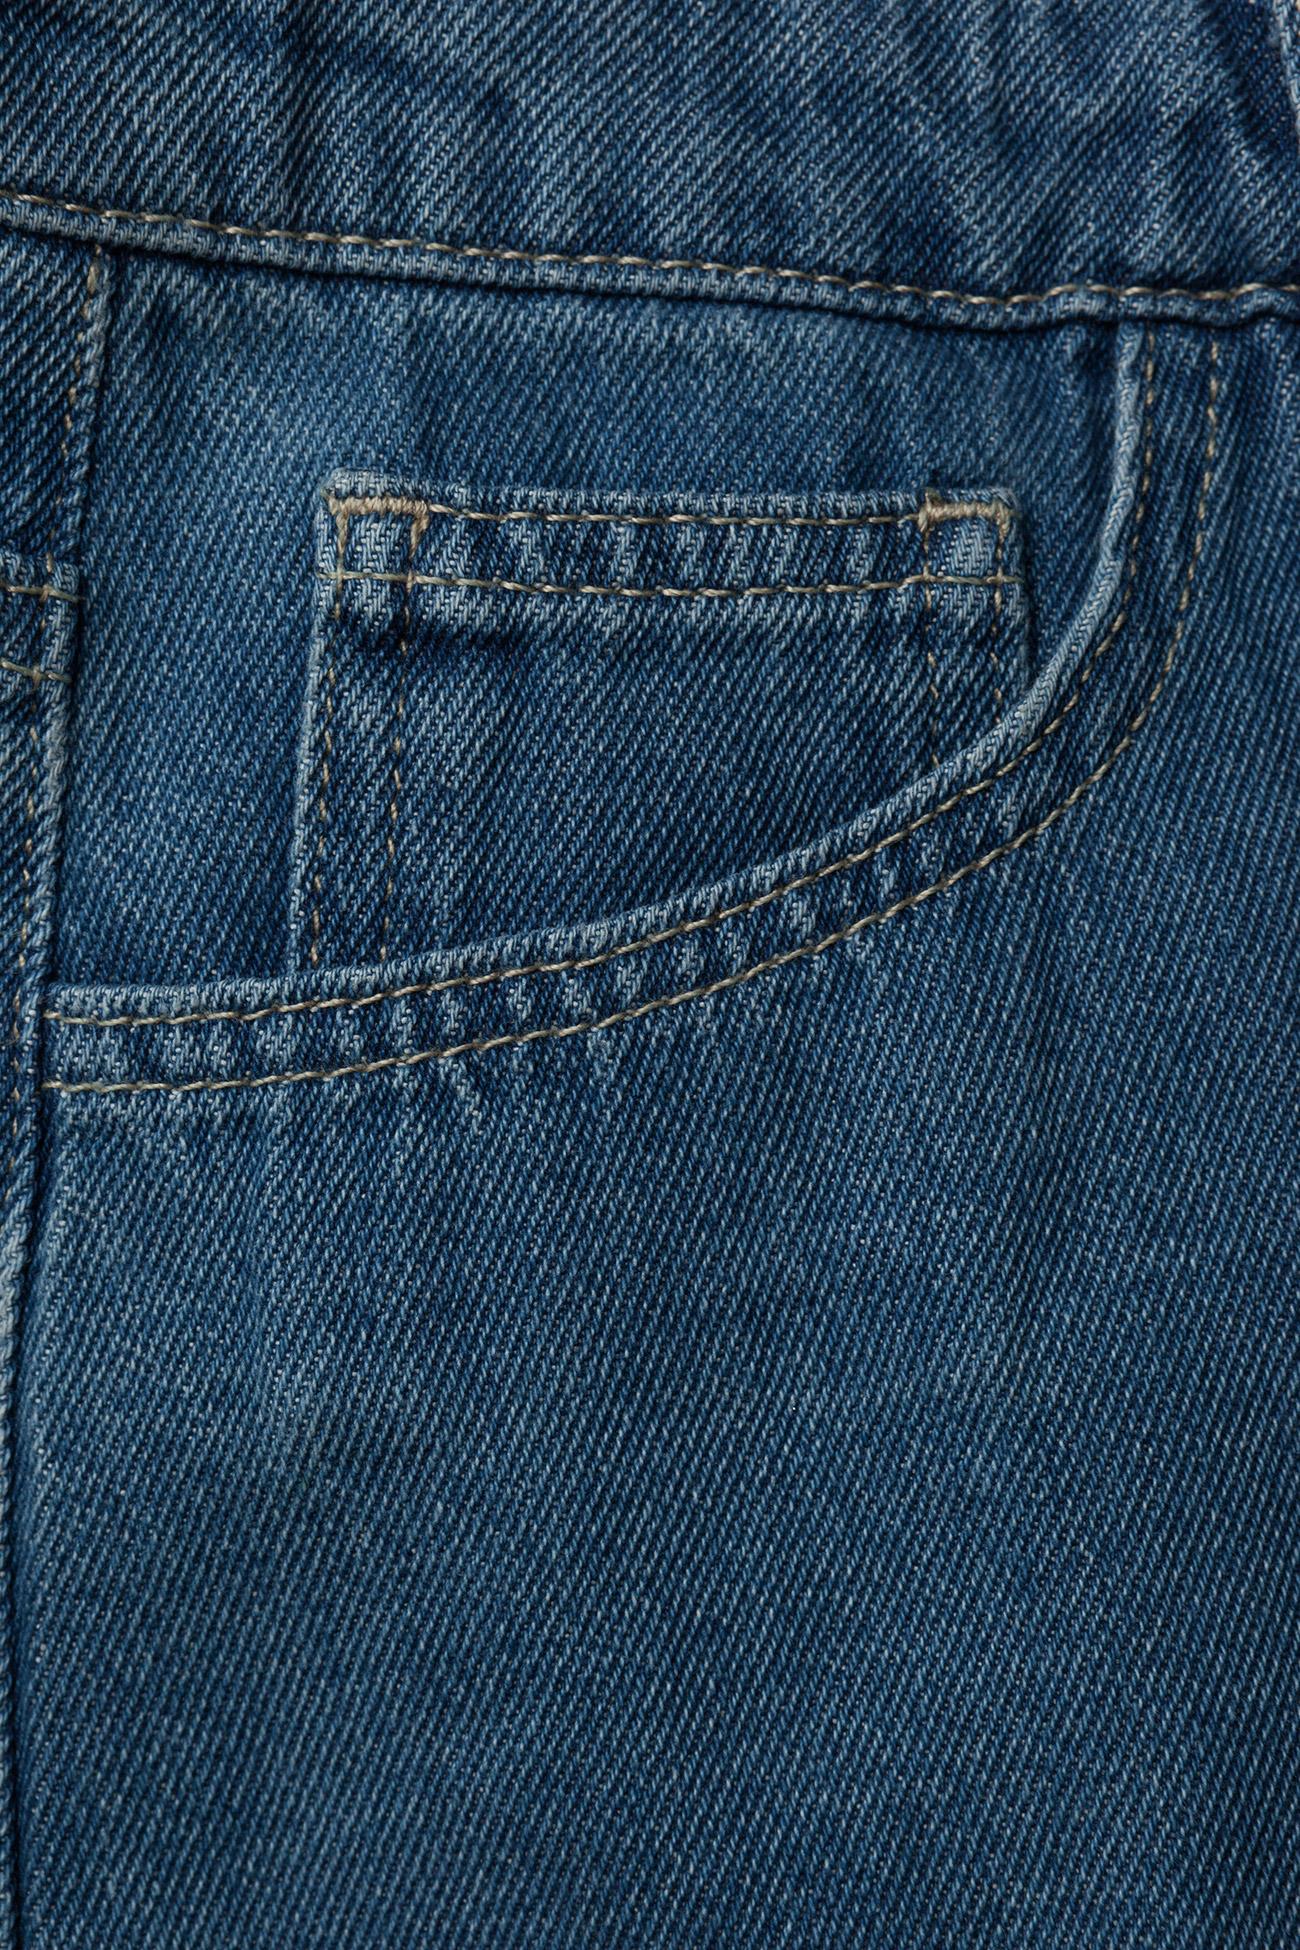 Connection Jeansvintage Wide Leg BlueFrench Shelby Denim yNwOP0v8nm